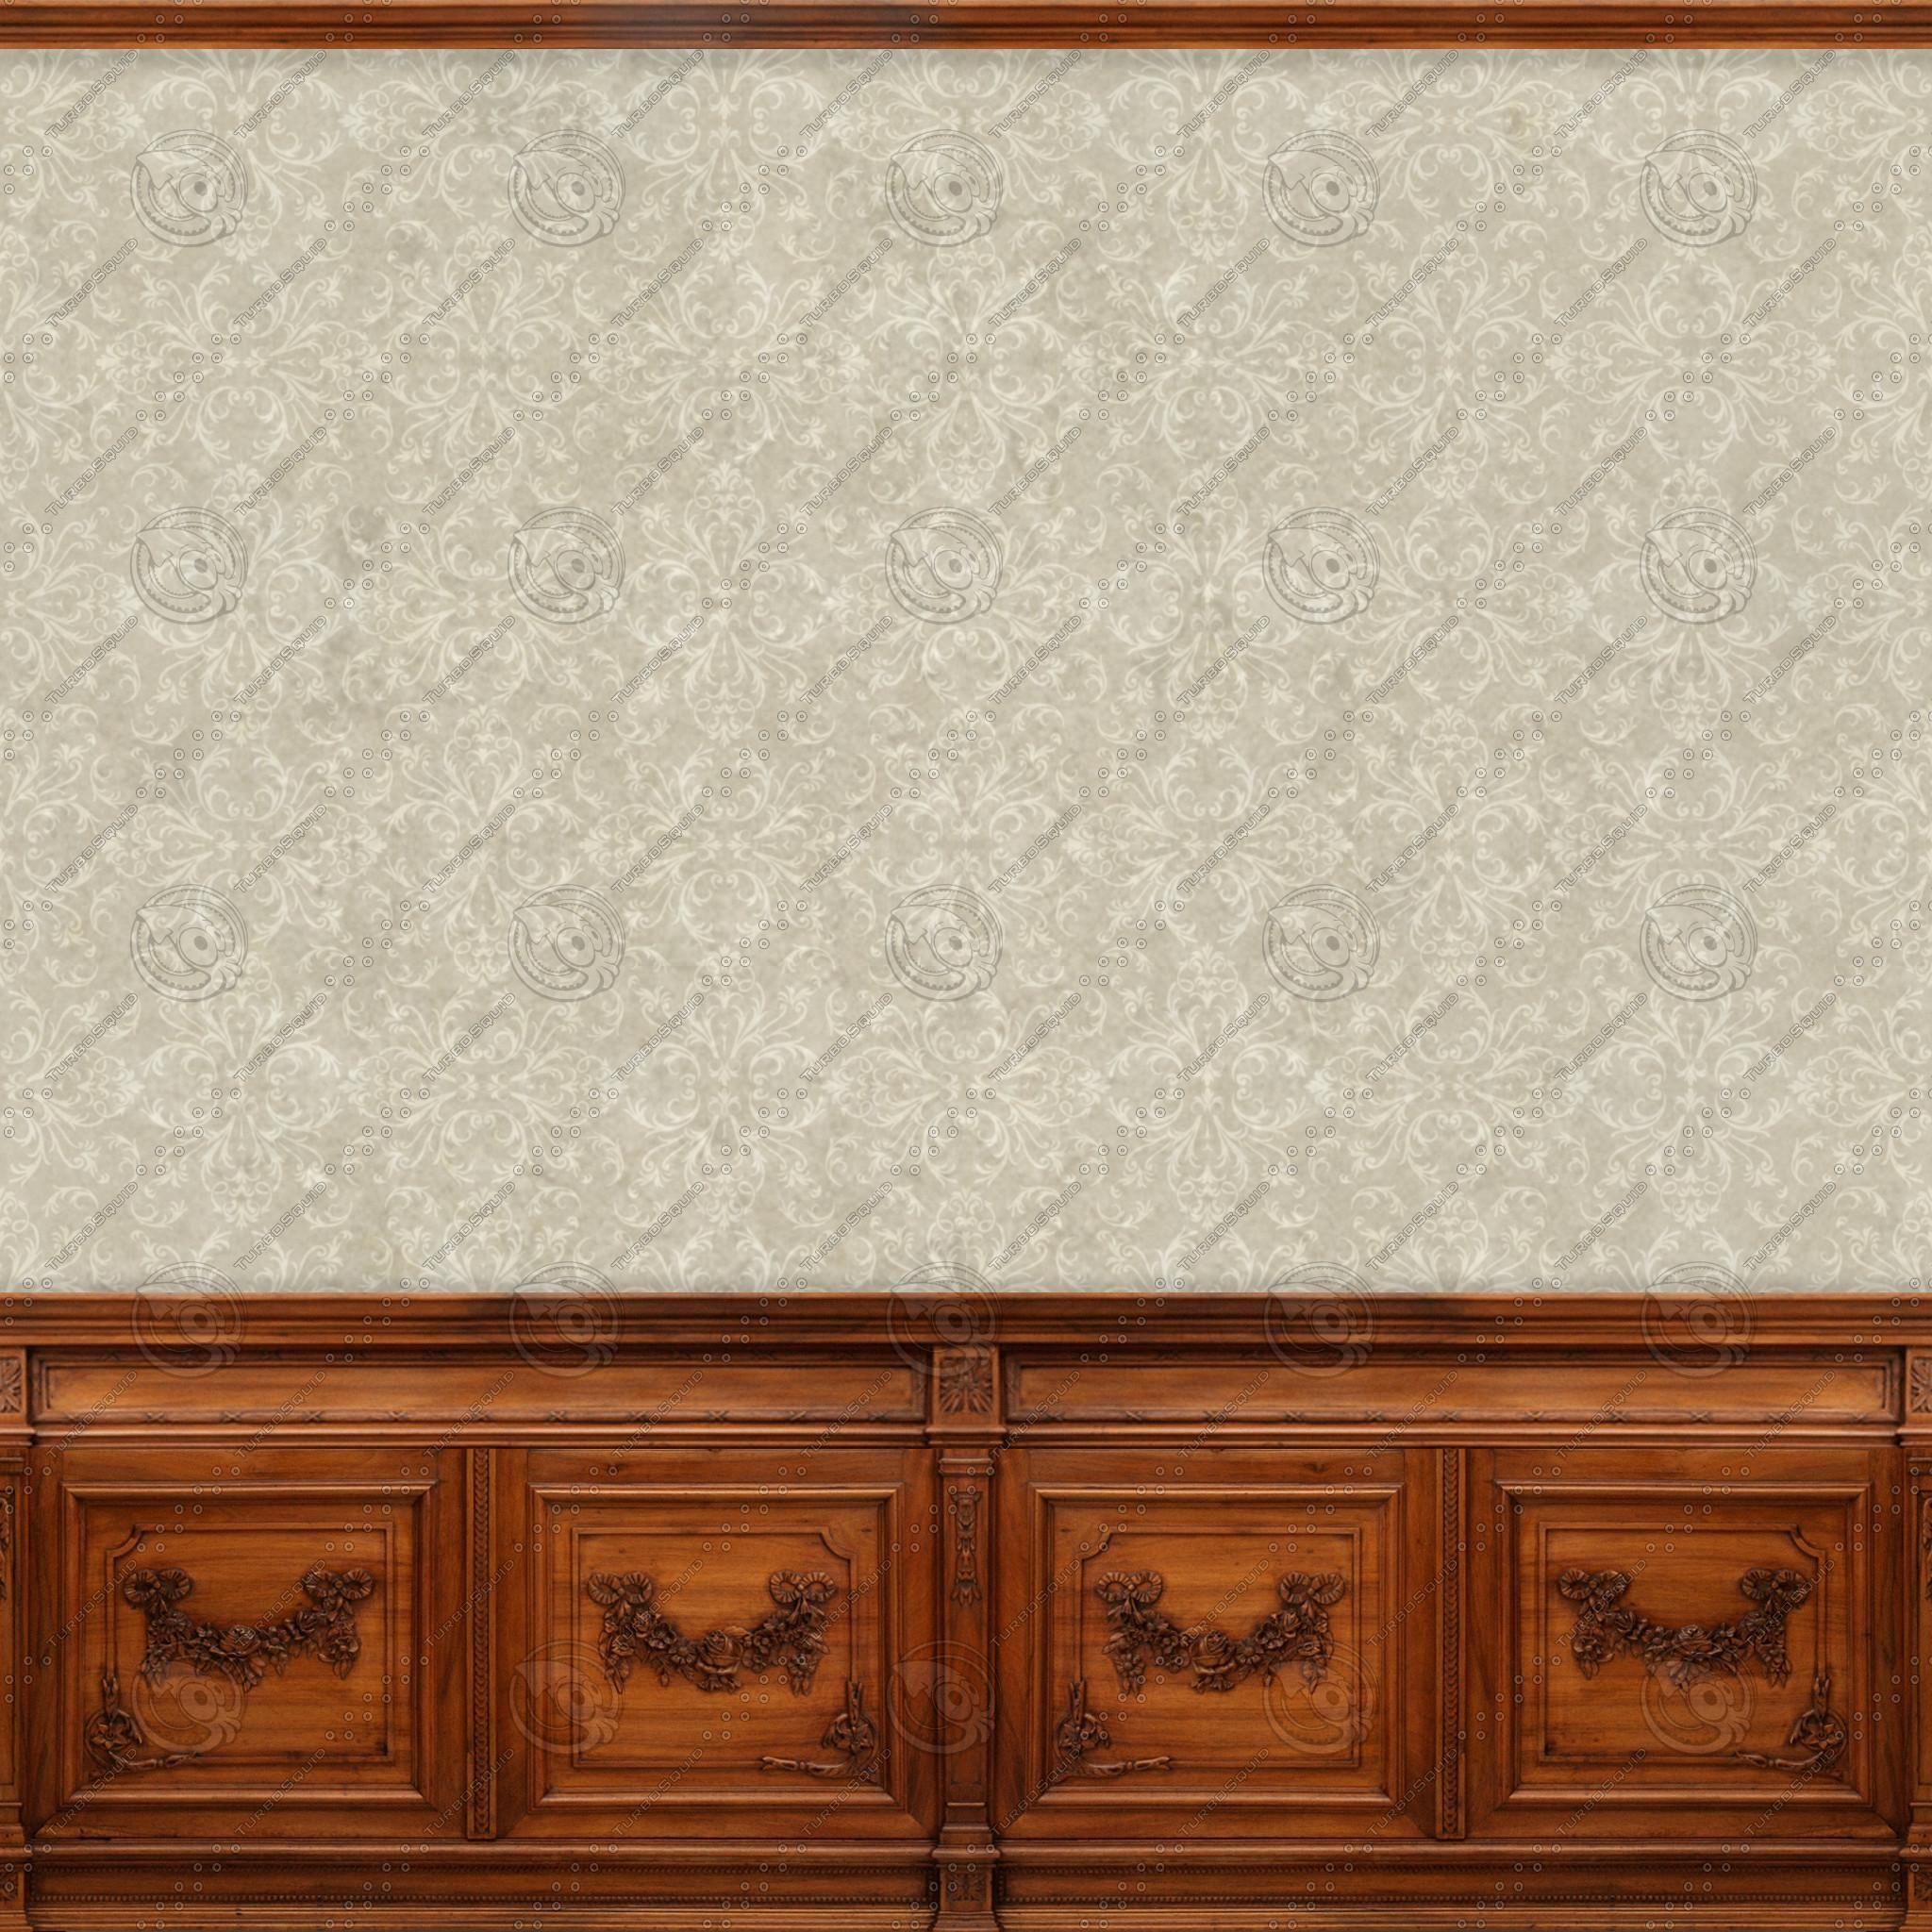 Image result for victorian walls & Image result for victorian walls | In The Next Room research ...